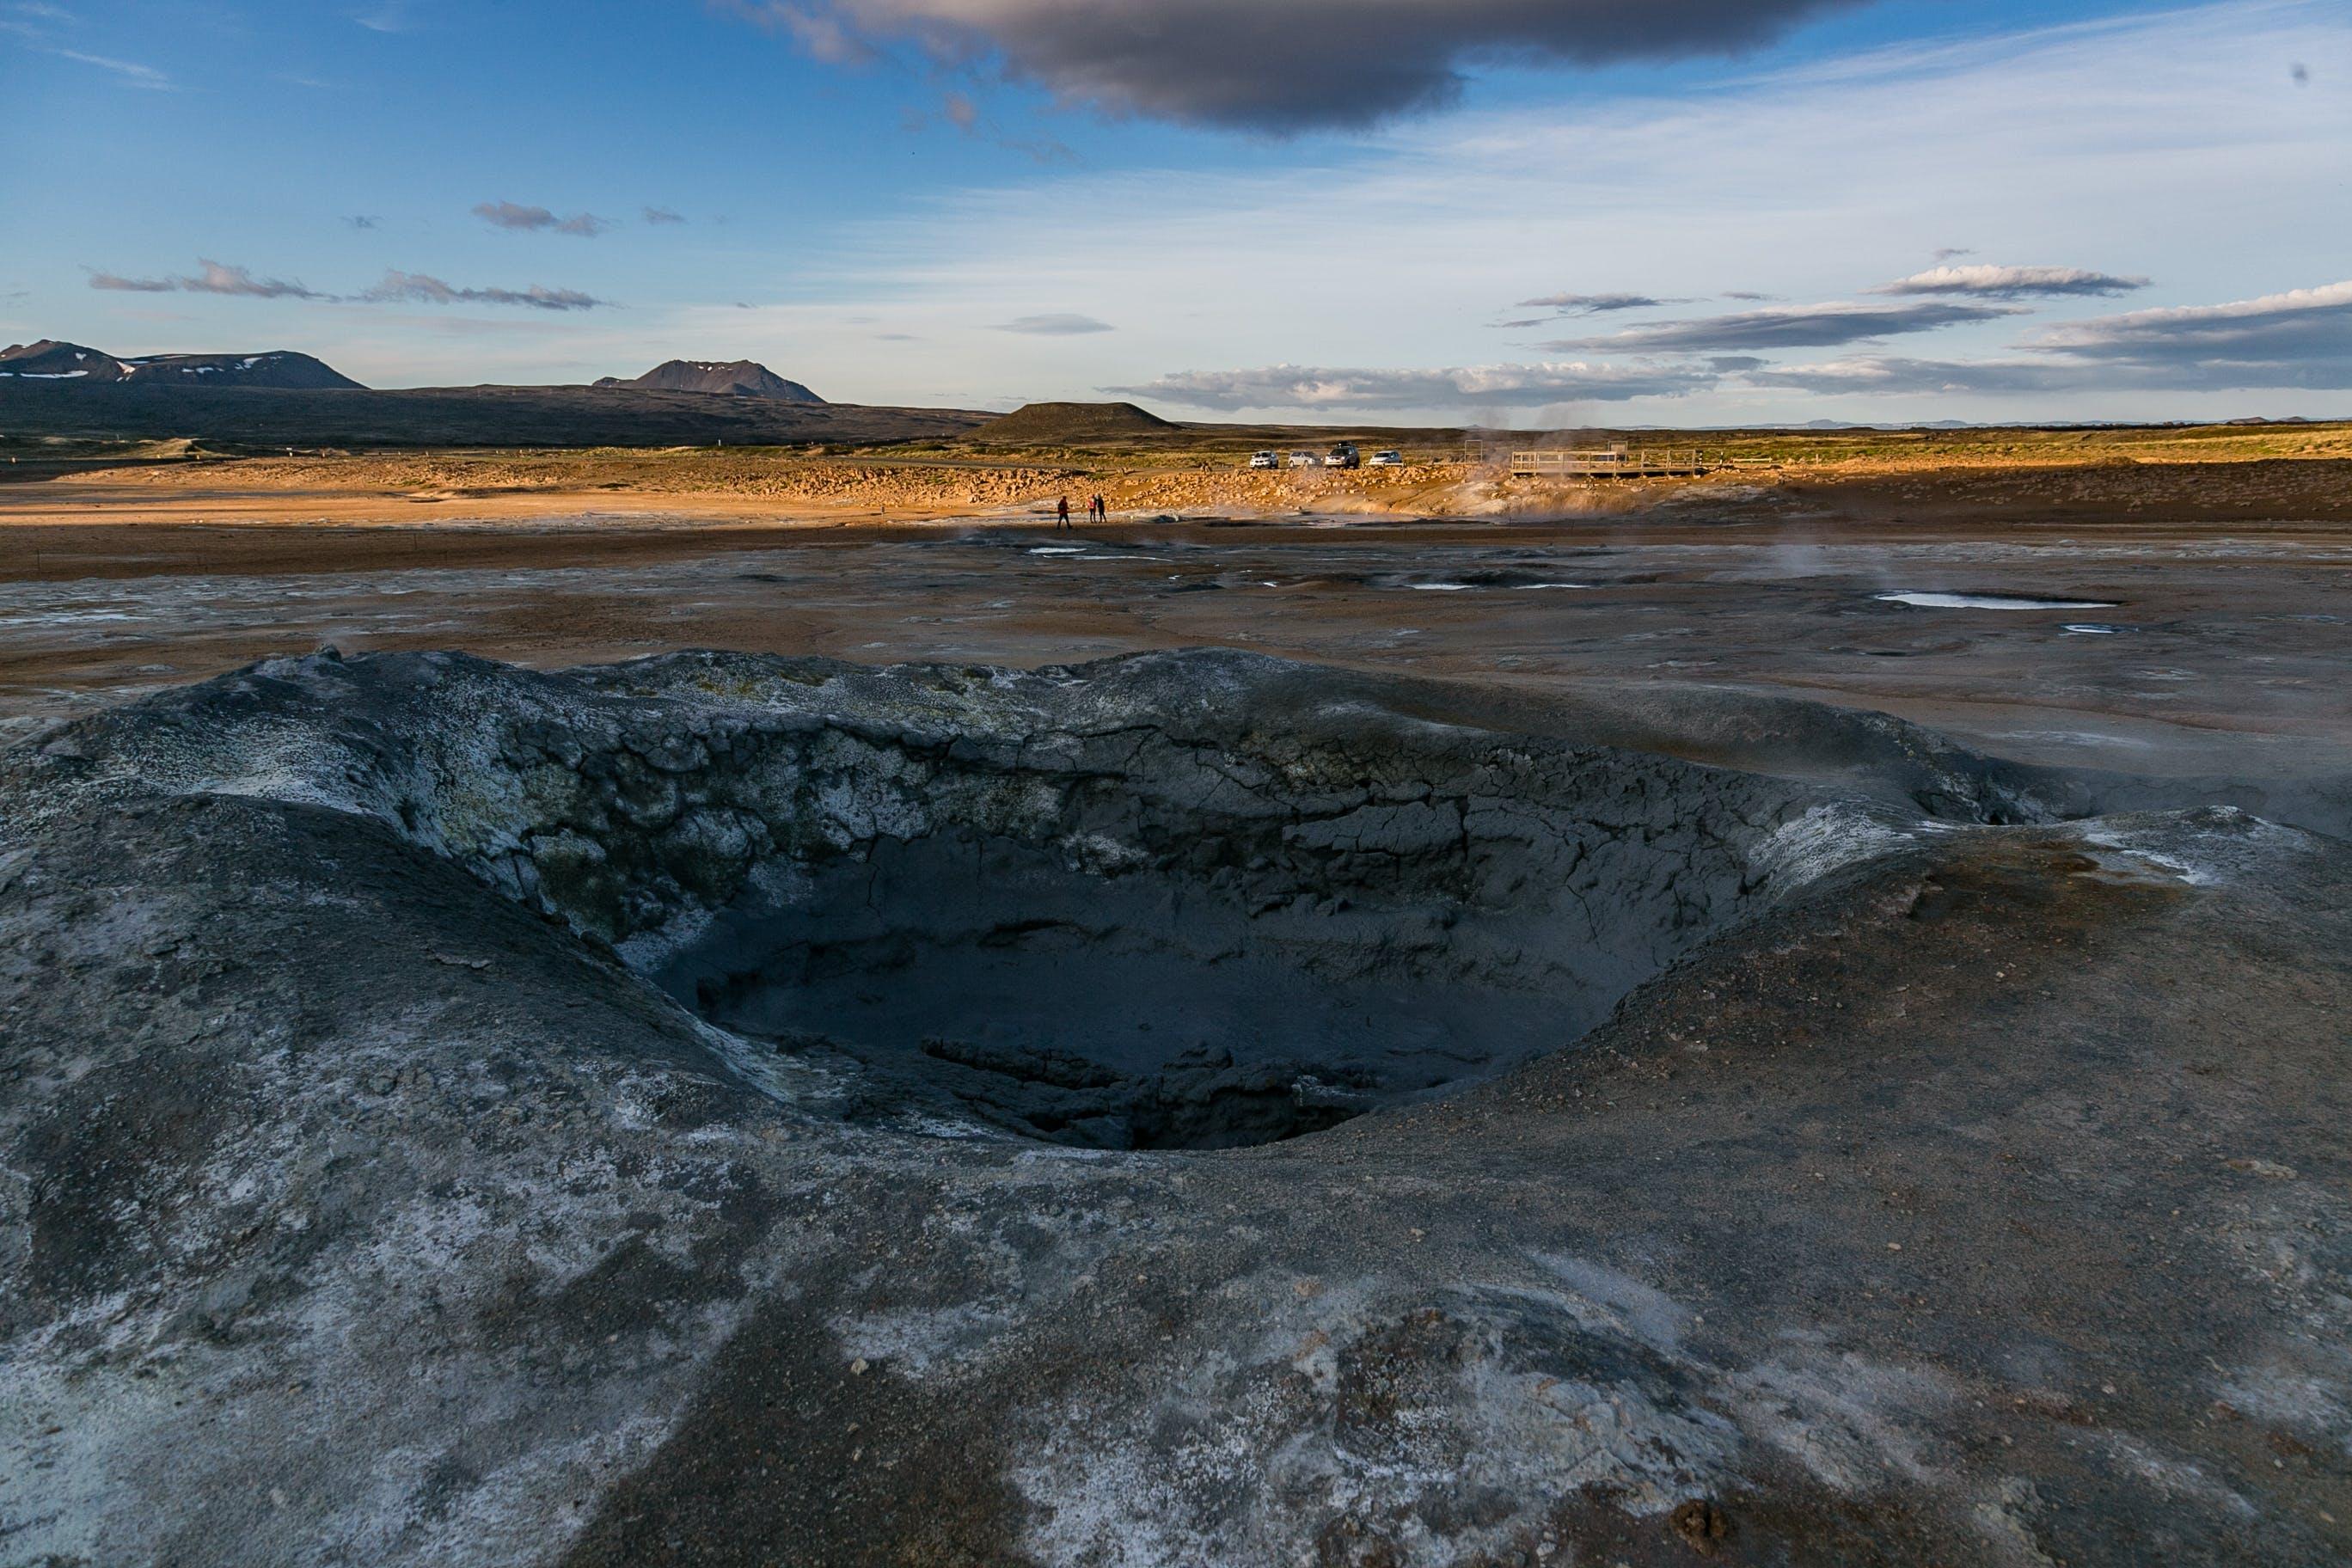 Aerial Photo of Volcano